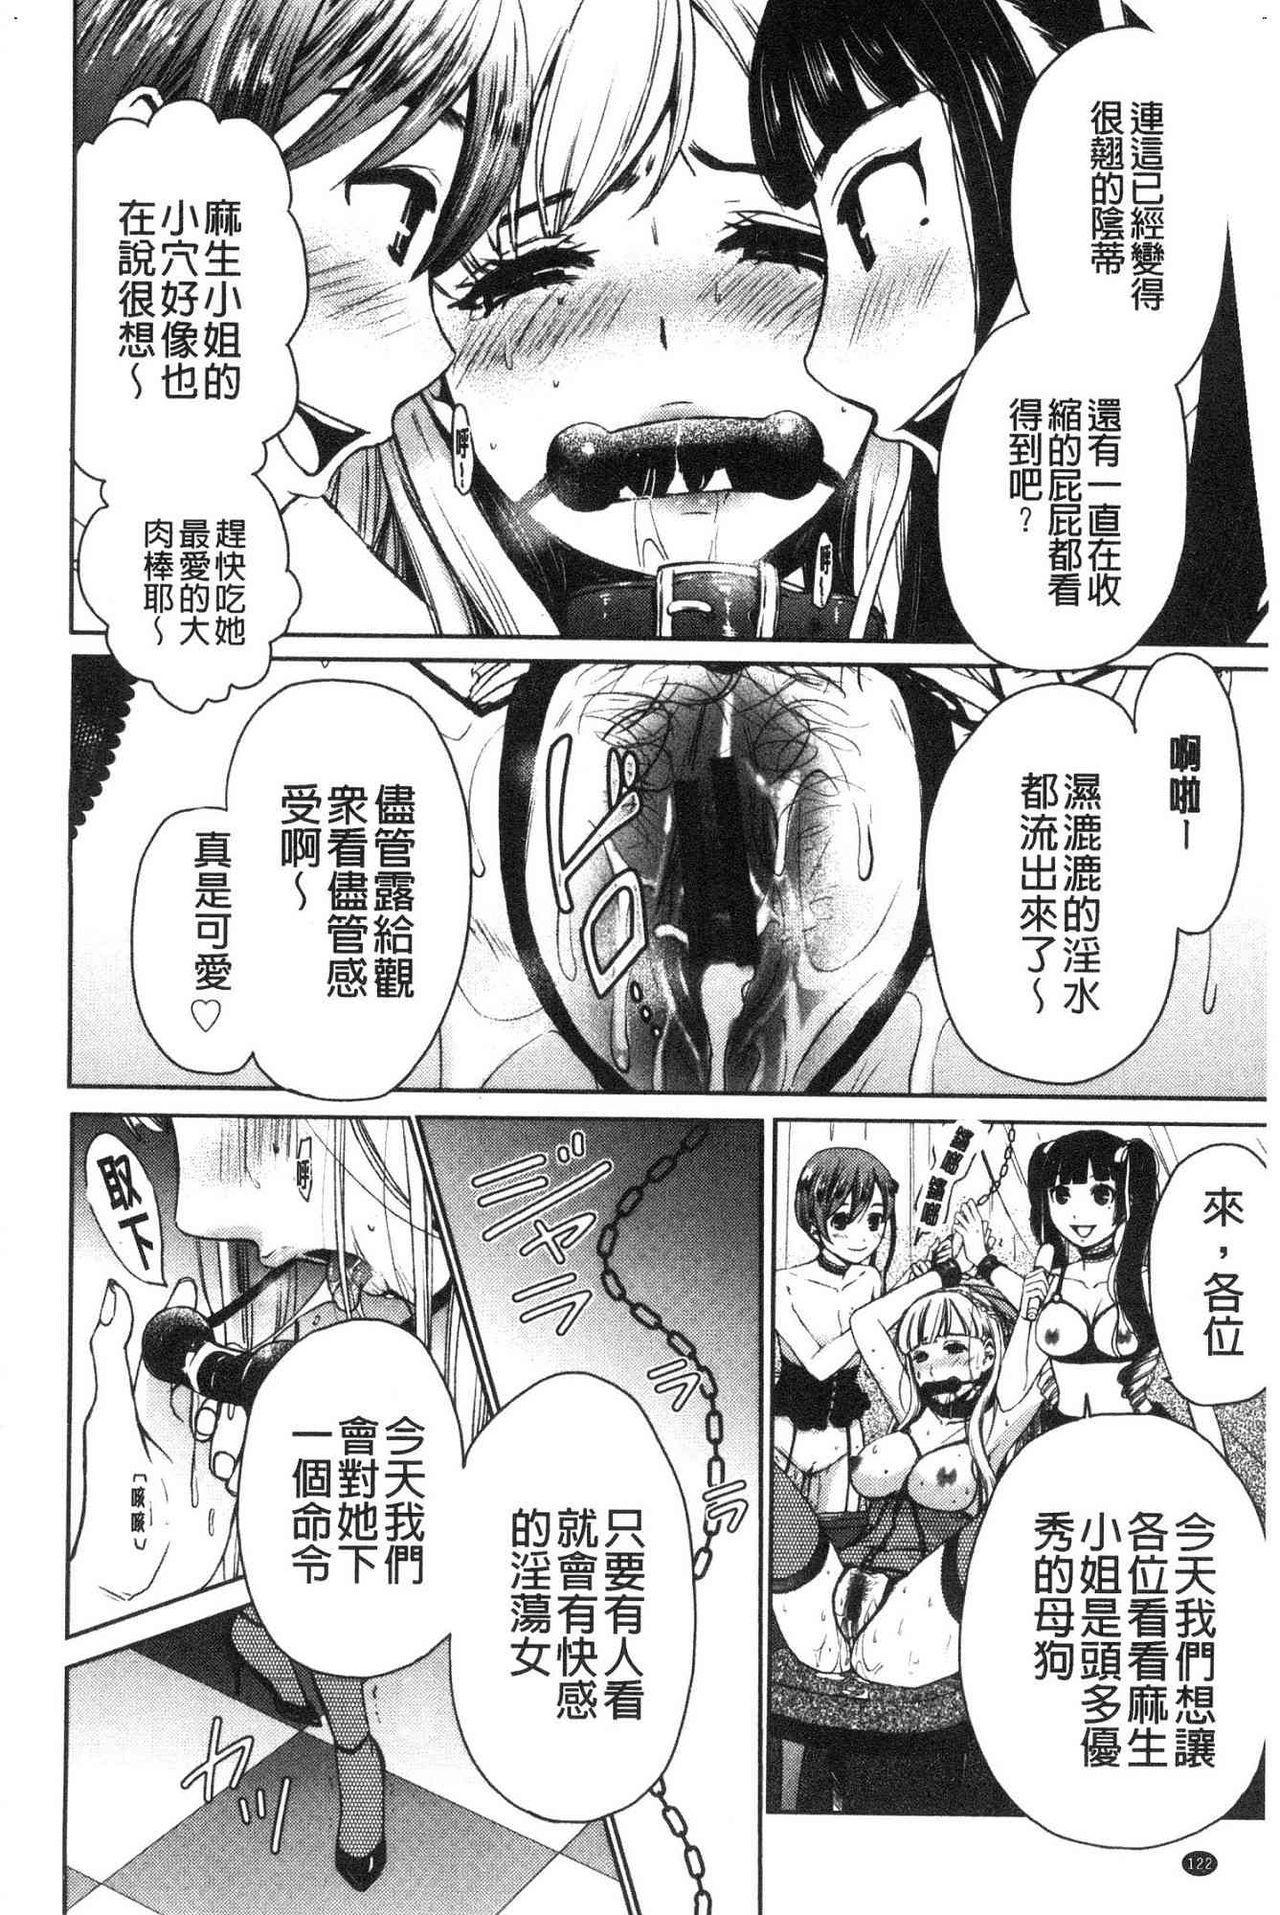 [Gotoh Akira]  21-ji no Onna ~Camera no Mae no Mesuinu~ 2 | 21時之女 ~鏡頭前的牝犬~ 2 [Chinese] 123